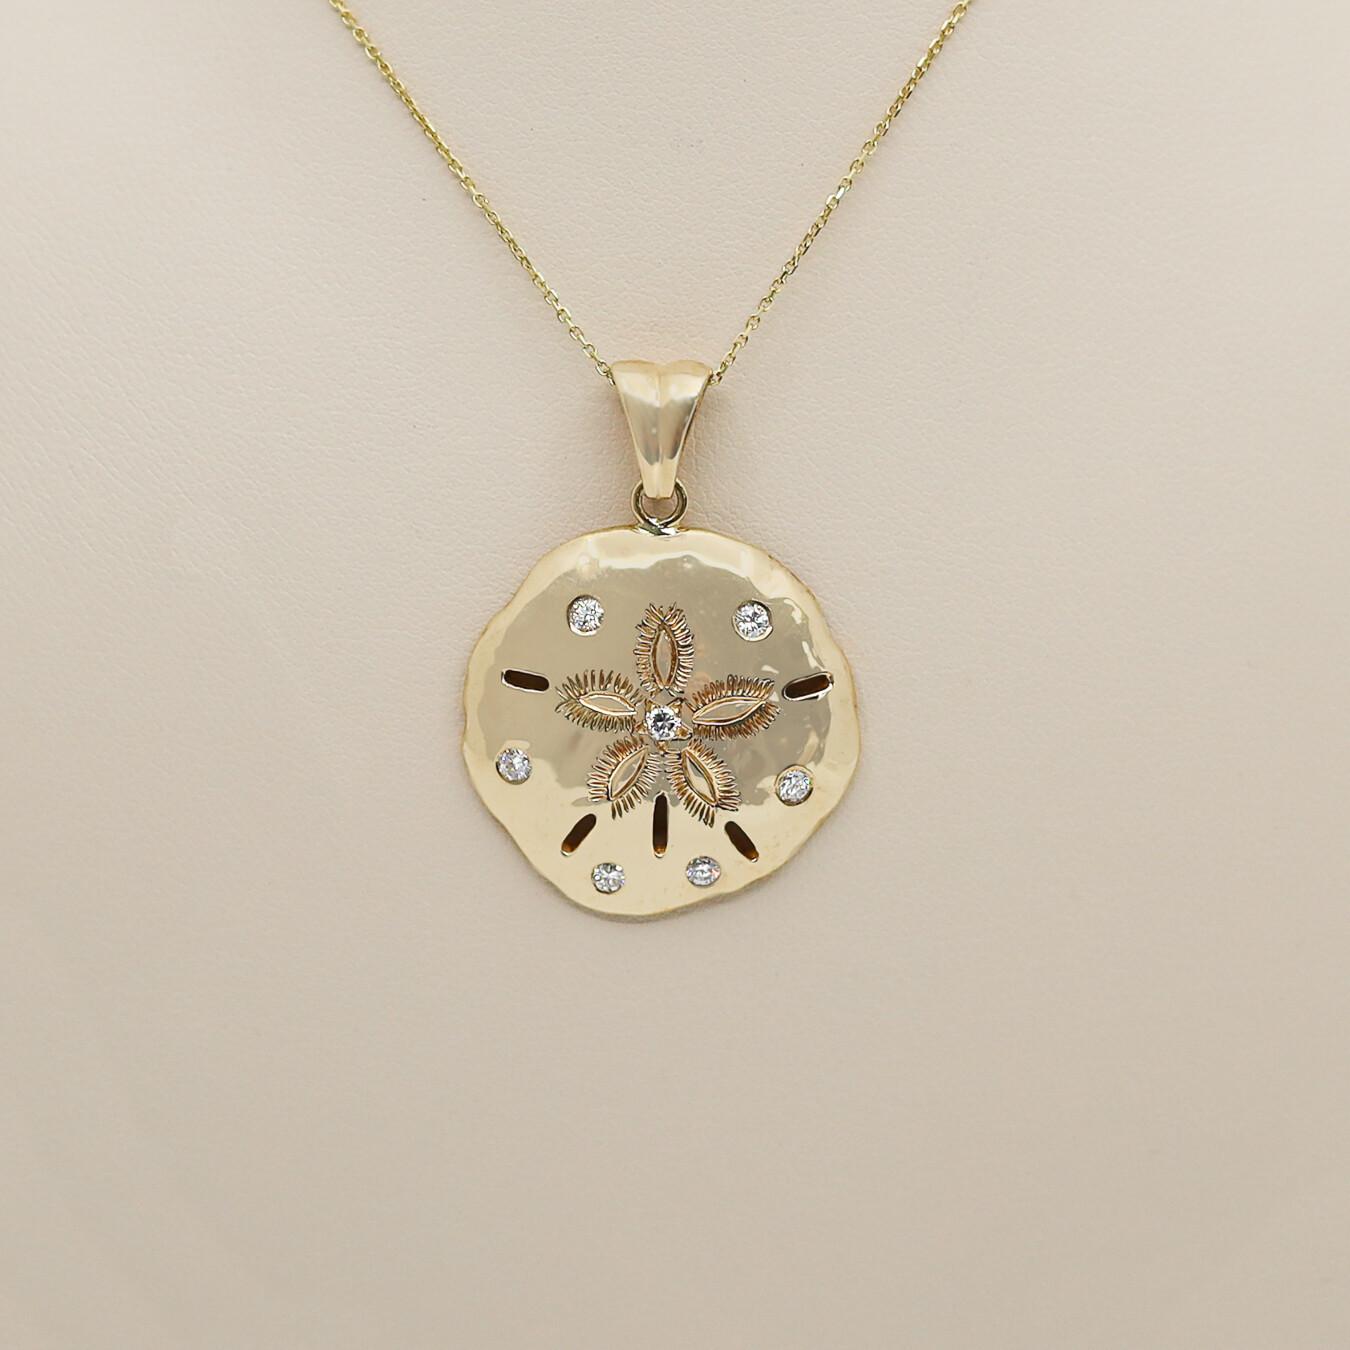 Sand Dollar Pendant with Diamonds